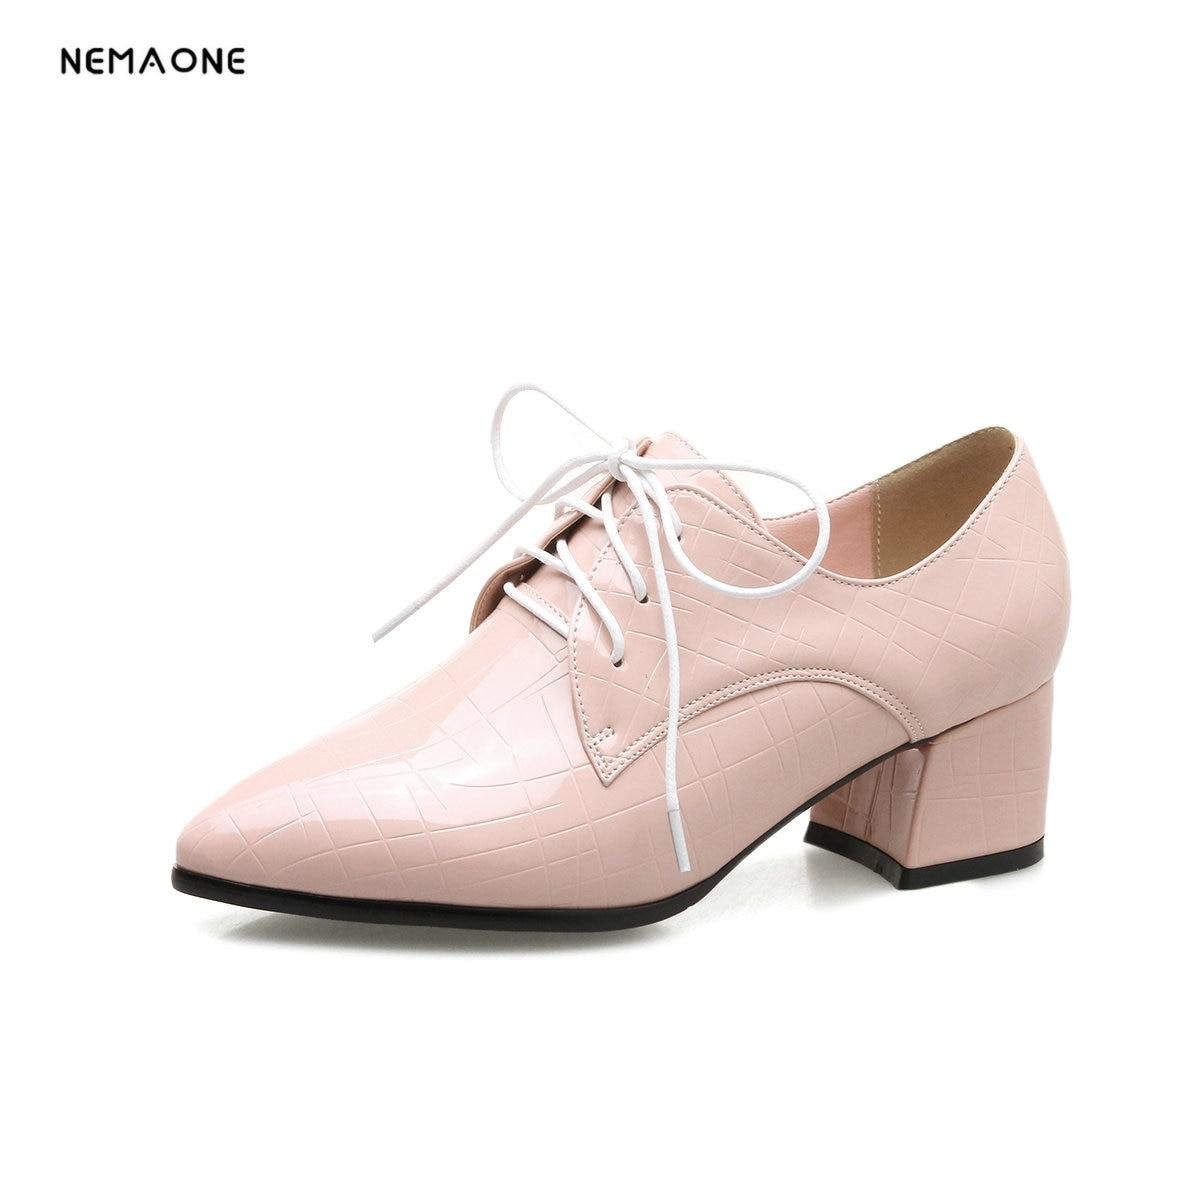 NEMAONE black fashion spring autumn new single shoes square thick heels women genuine leather high heels shoes nemaone new fashion 2018 genuine leather